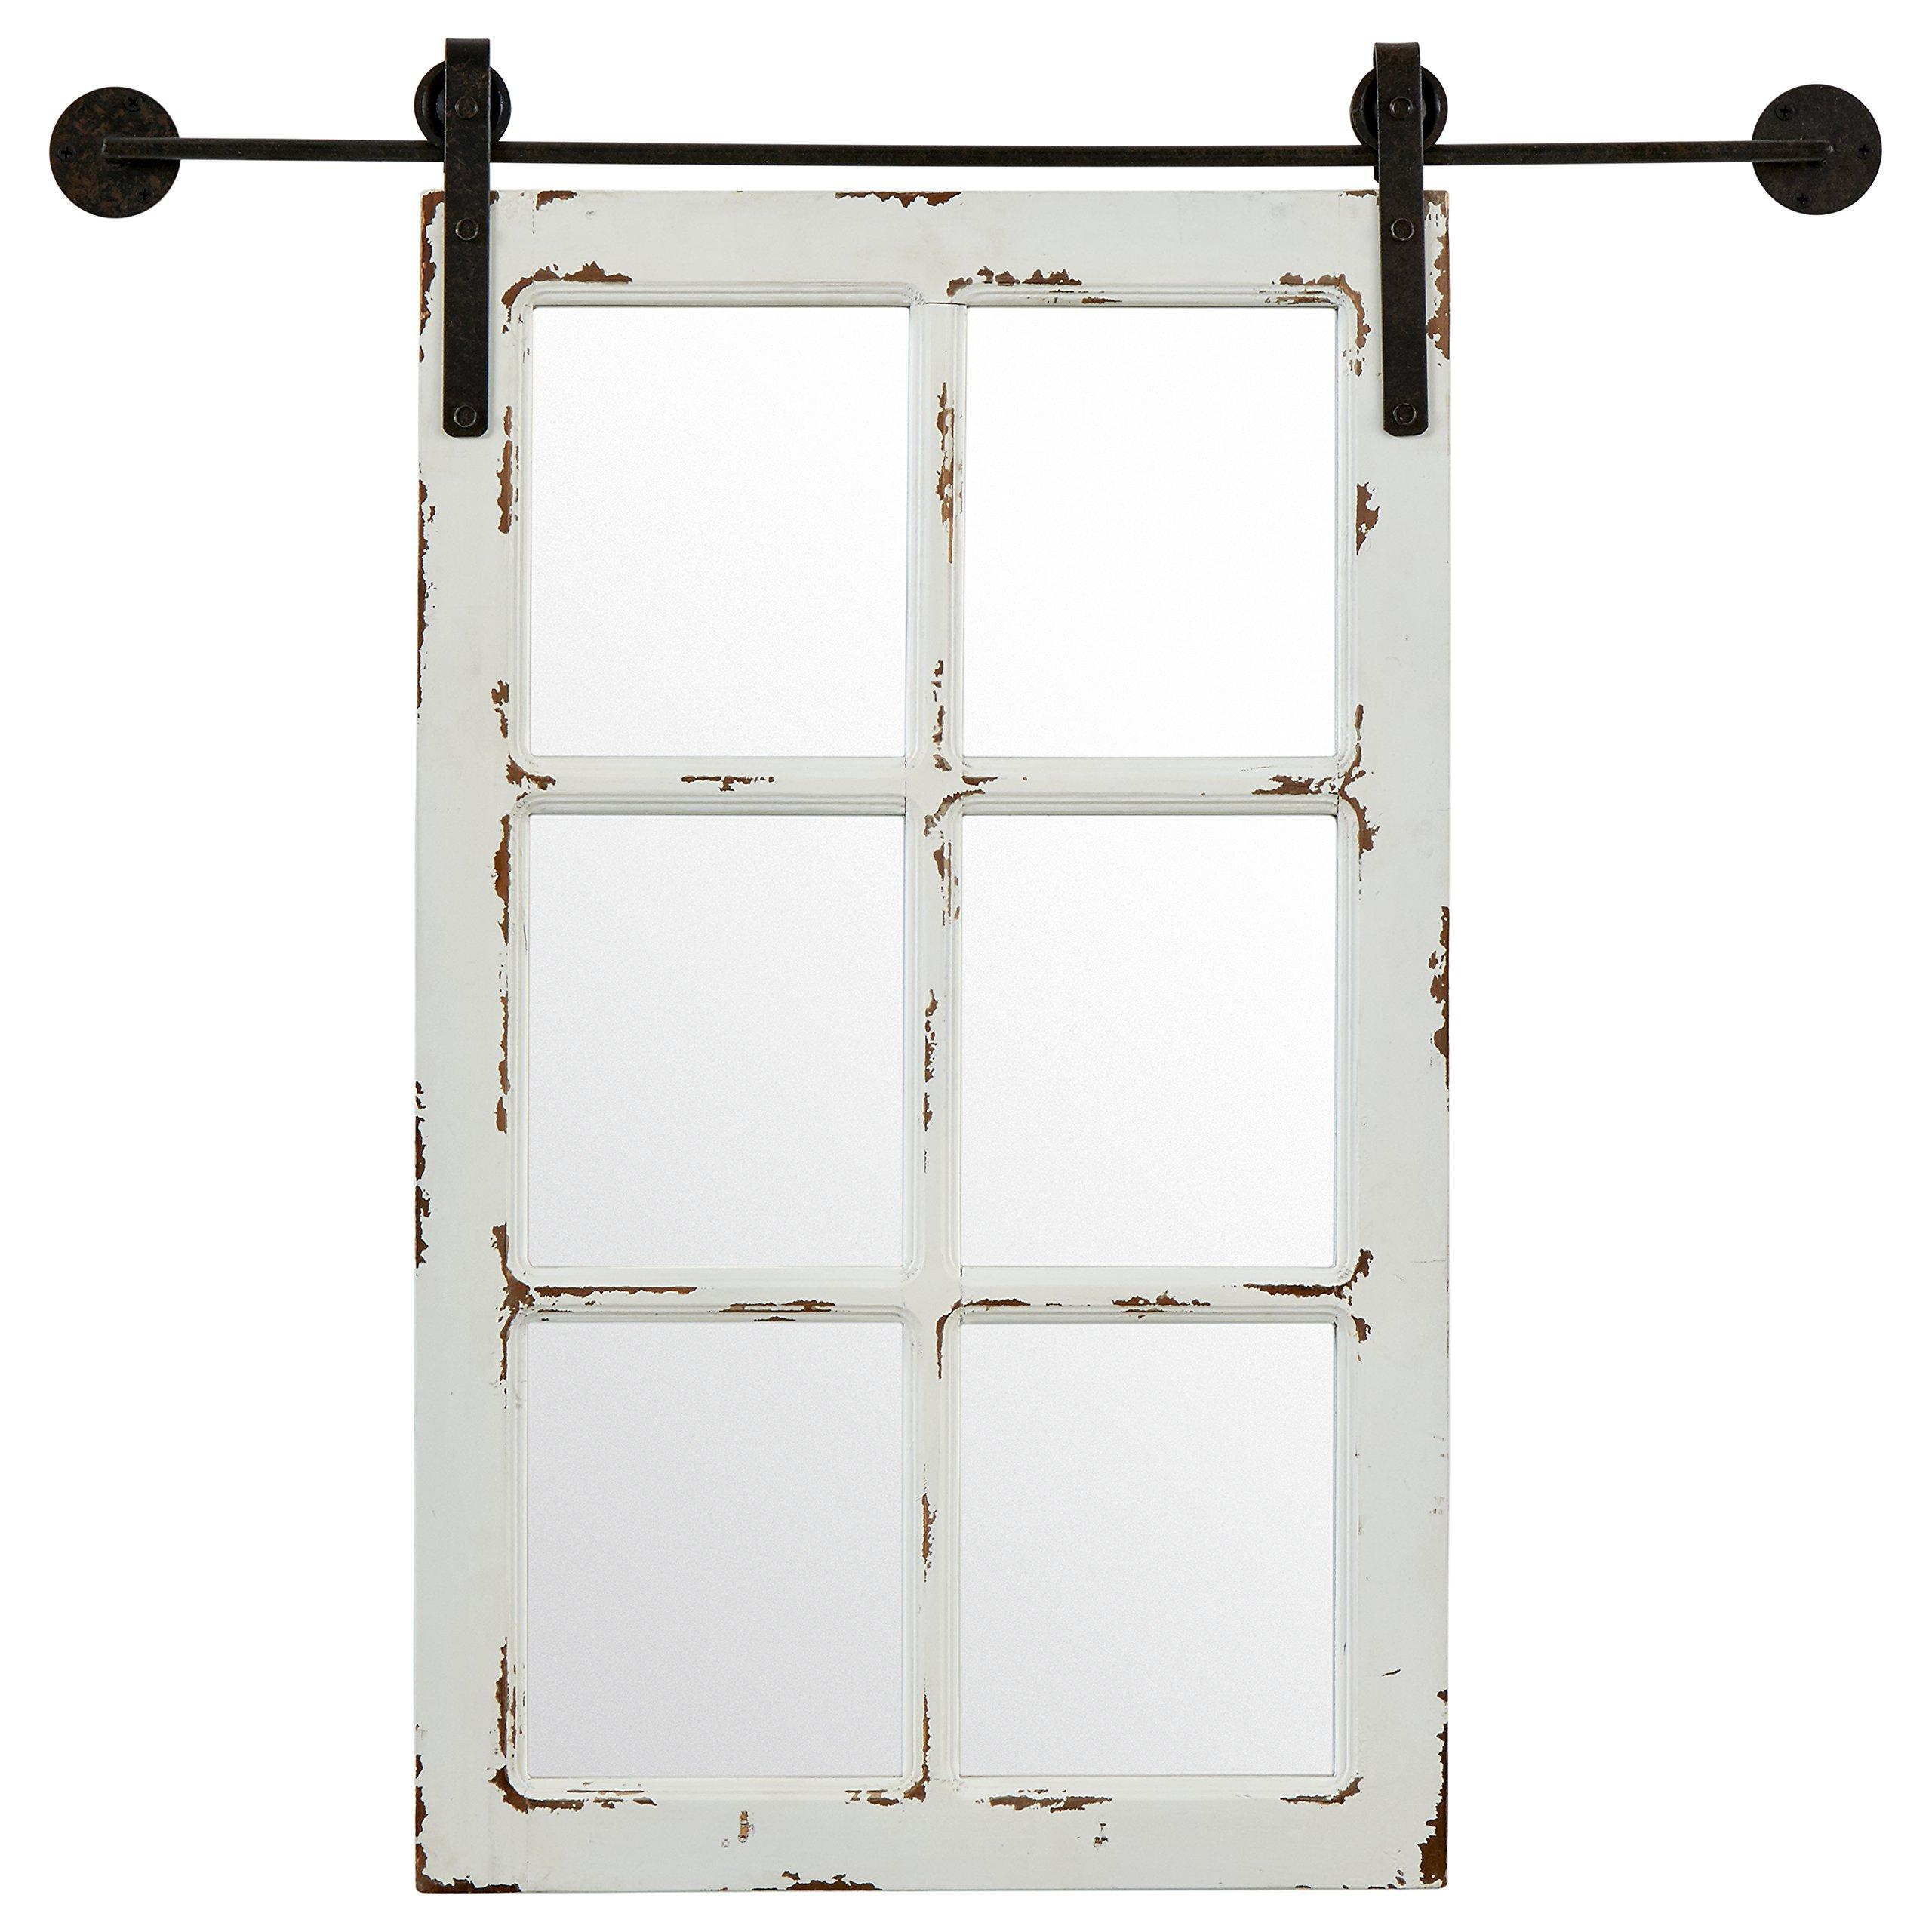 Stone & Beam Vintage-Look Rectangular Frame White Window Wood Mirror, 32.75 Inch Height, White by Stone & Beam